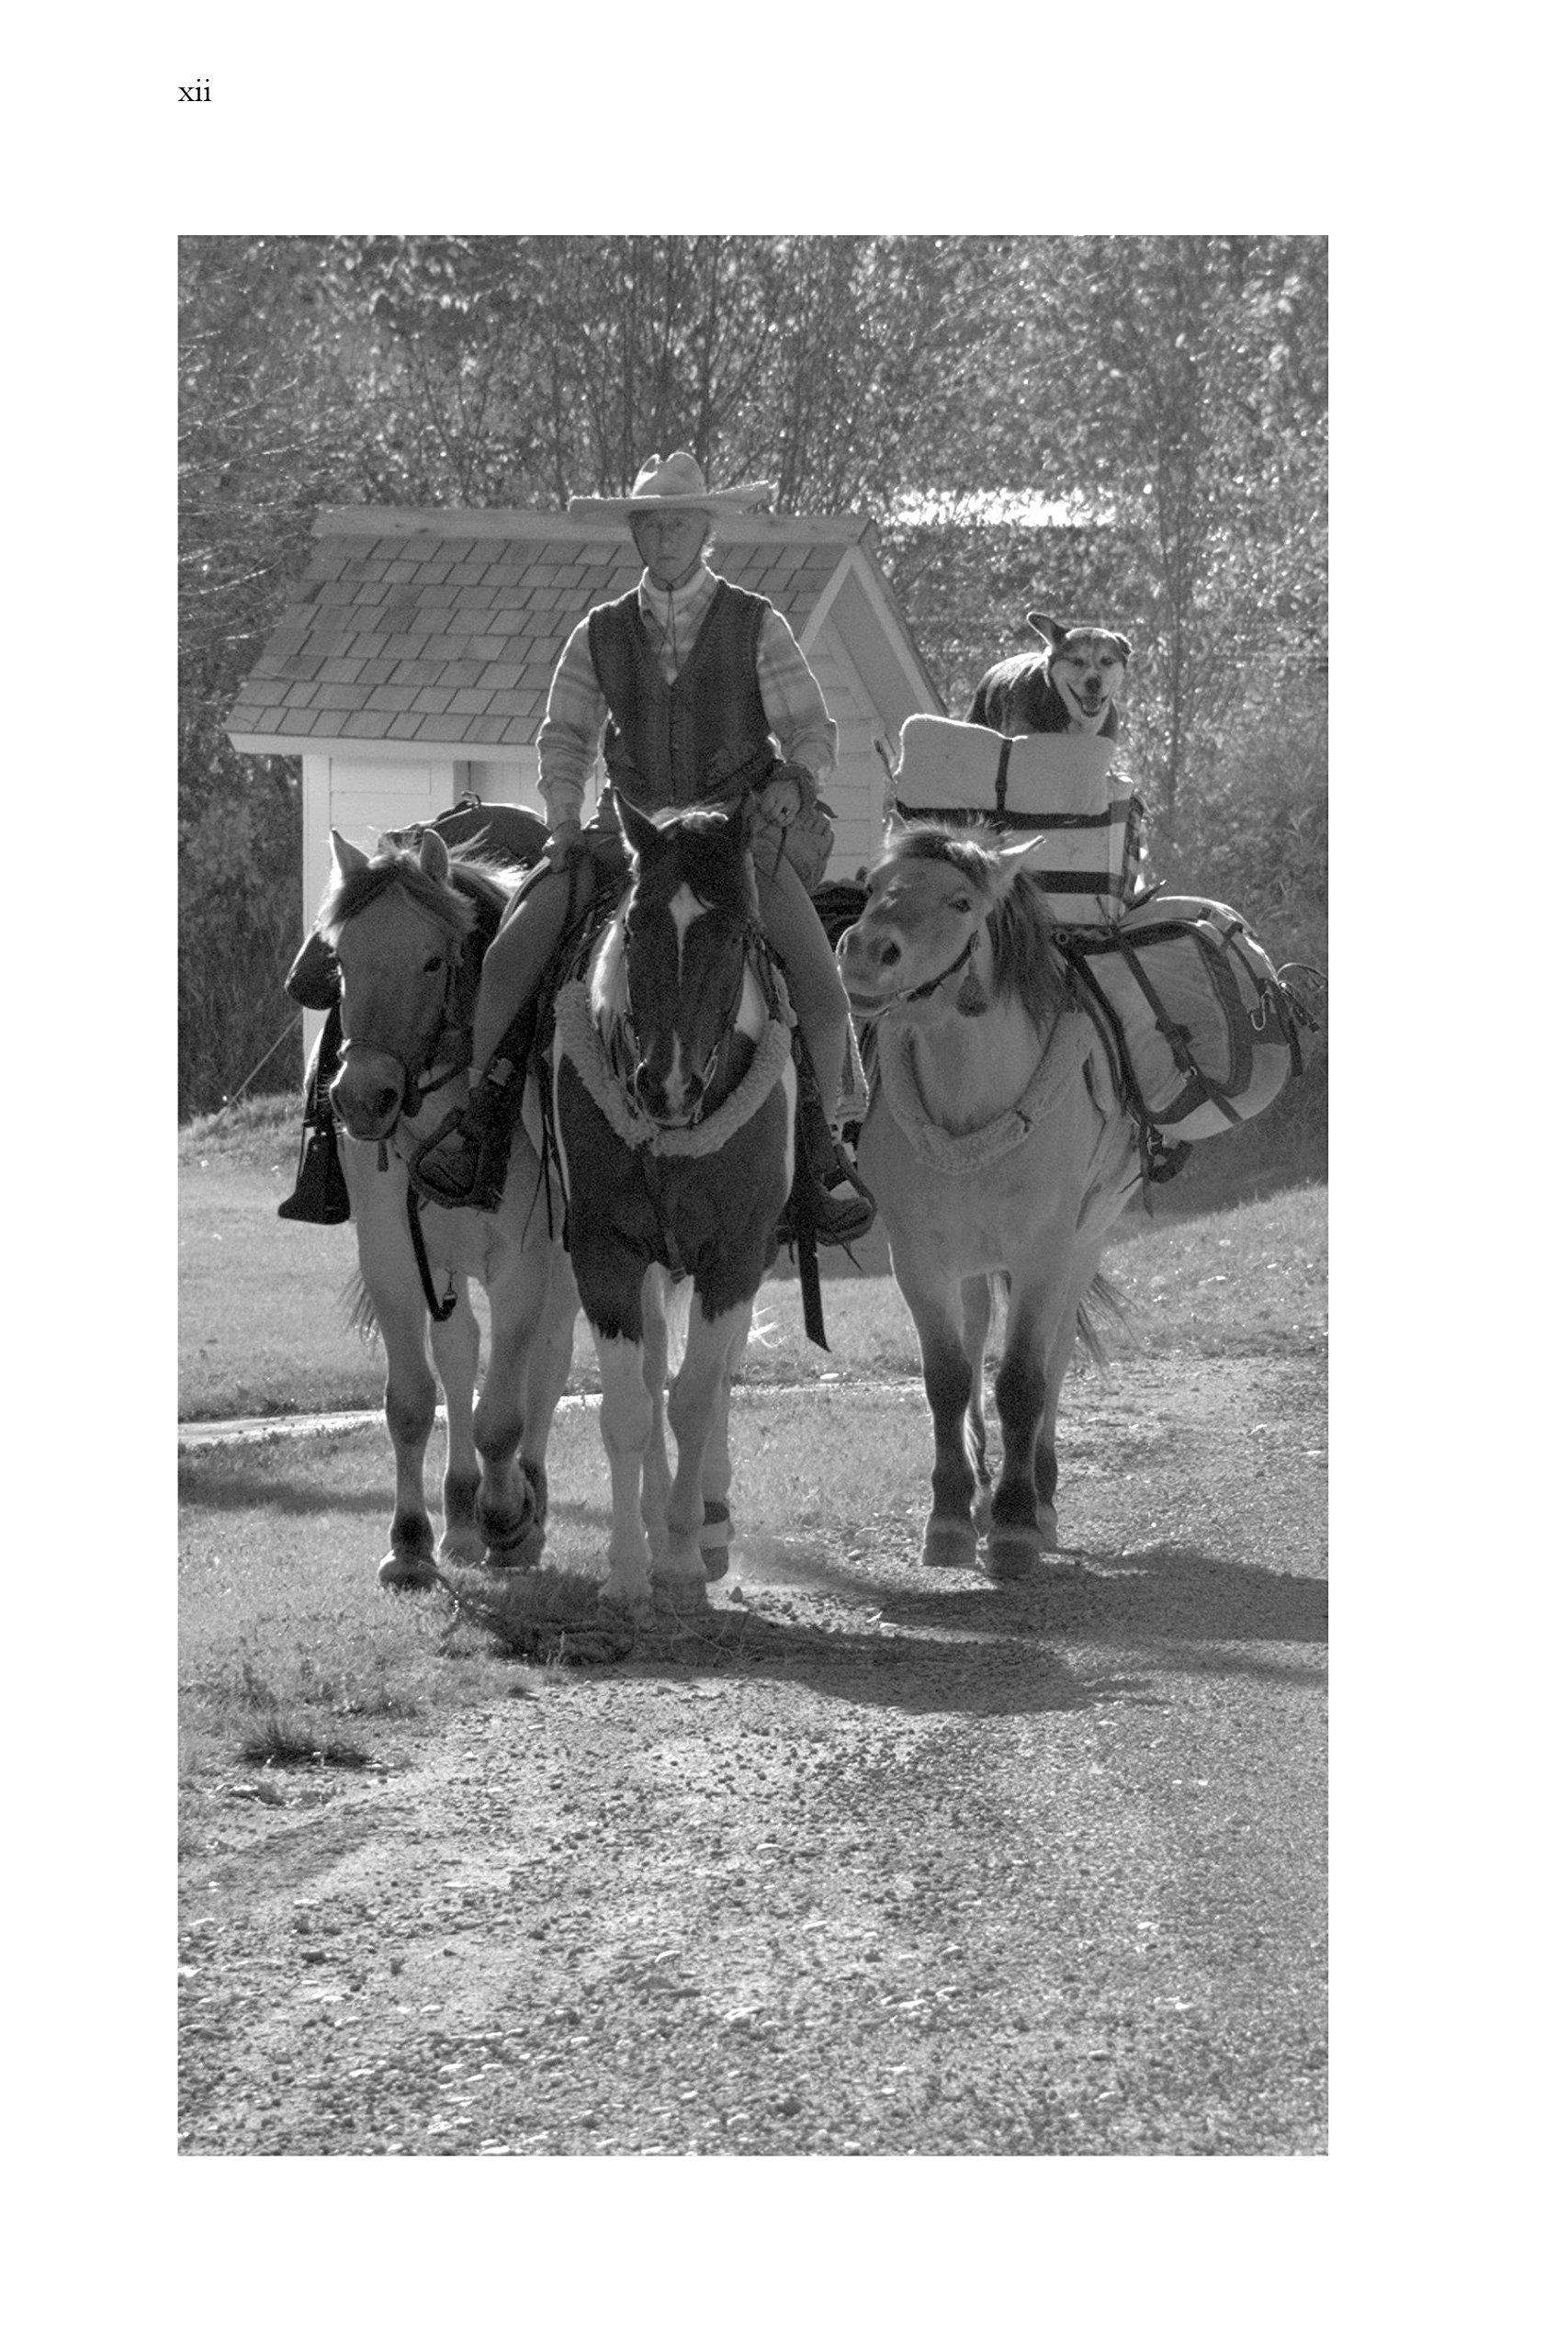 Lady Long Rider: Alone Across America on Horseback: Bernice